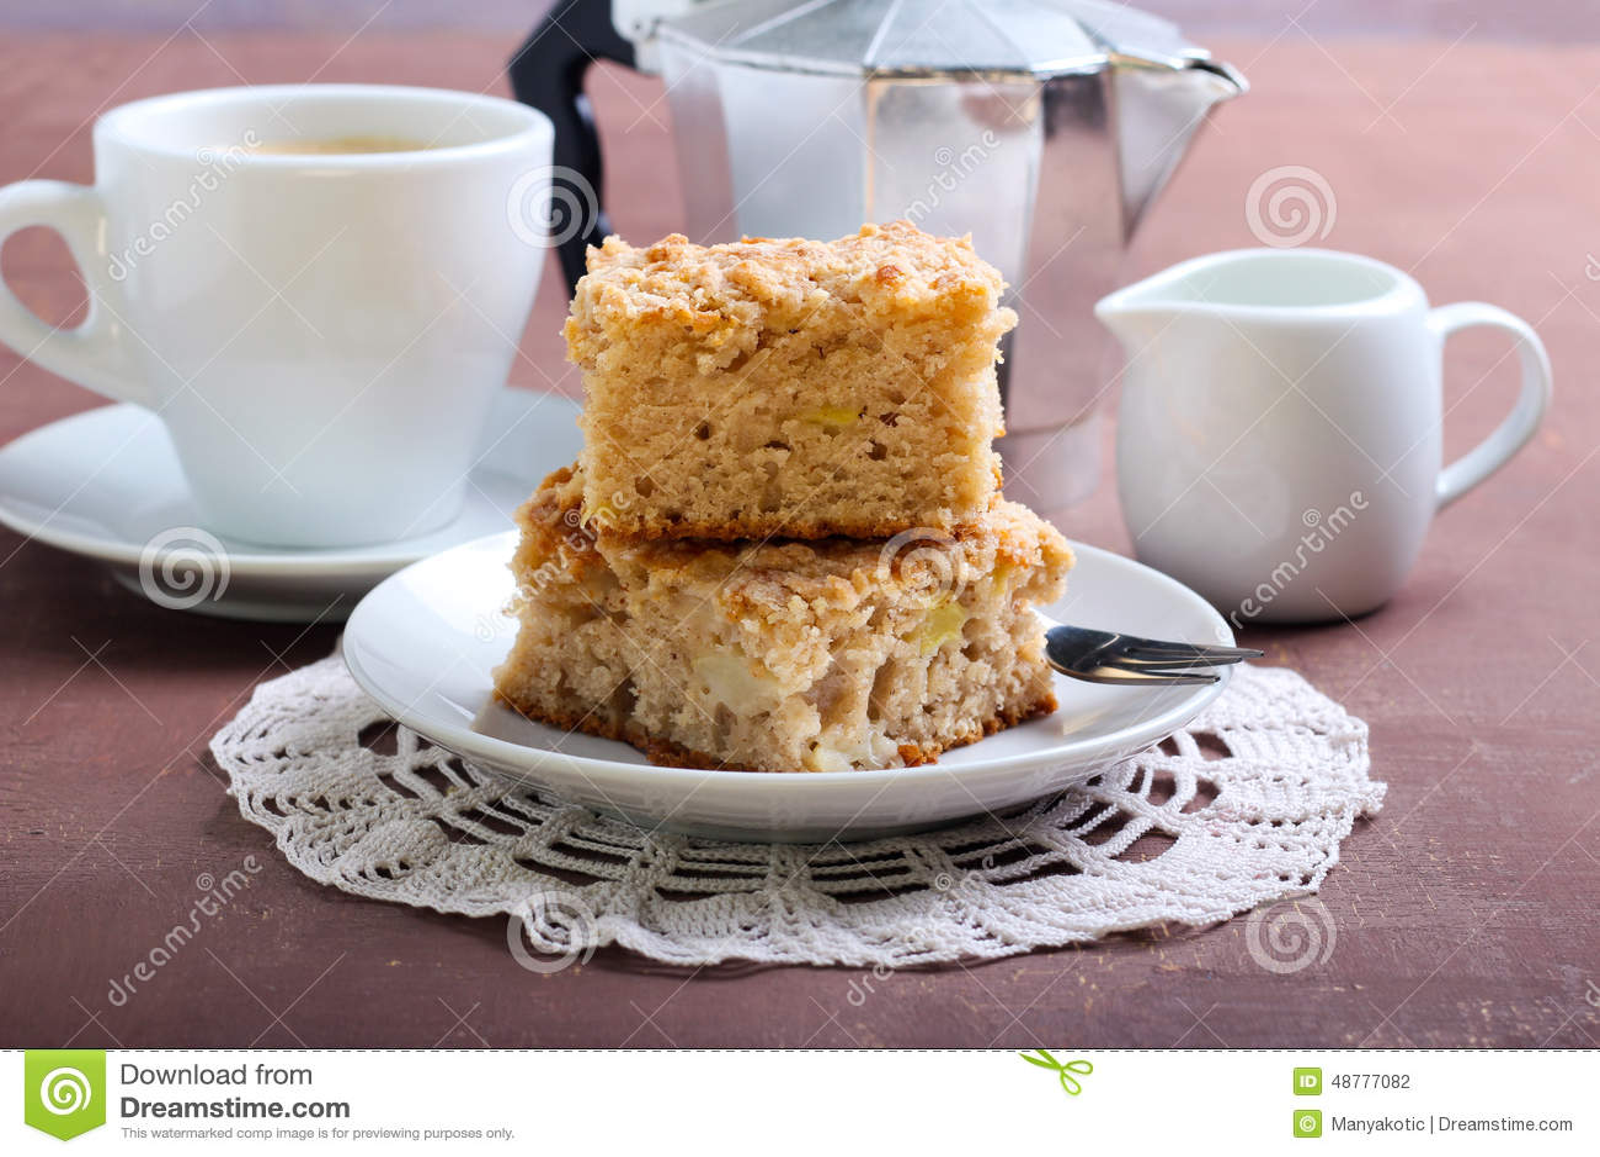 Raw Apple Cake Made With Coffee